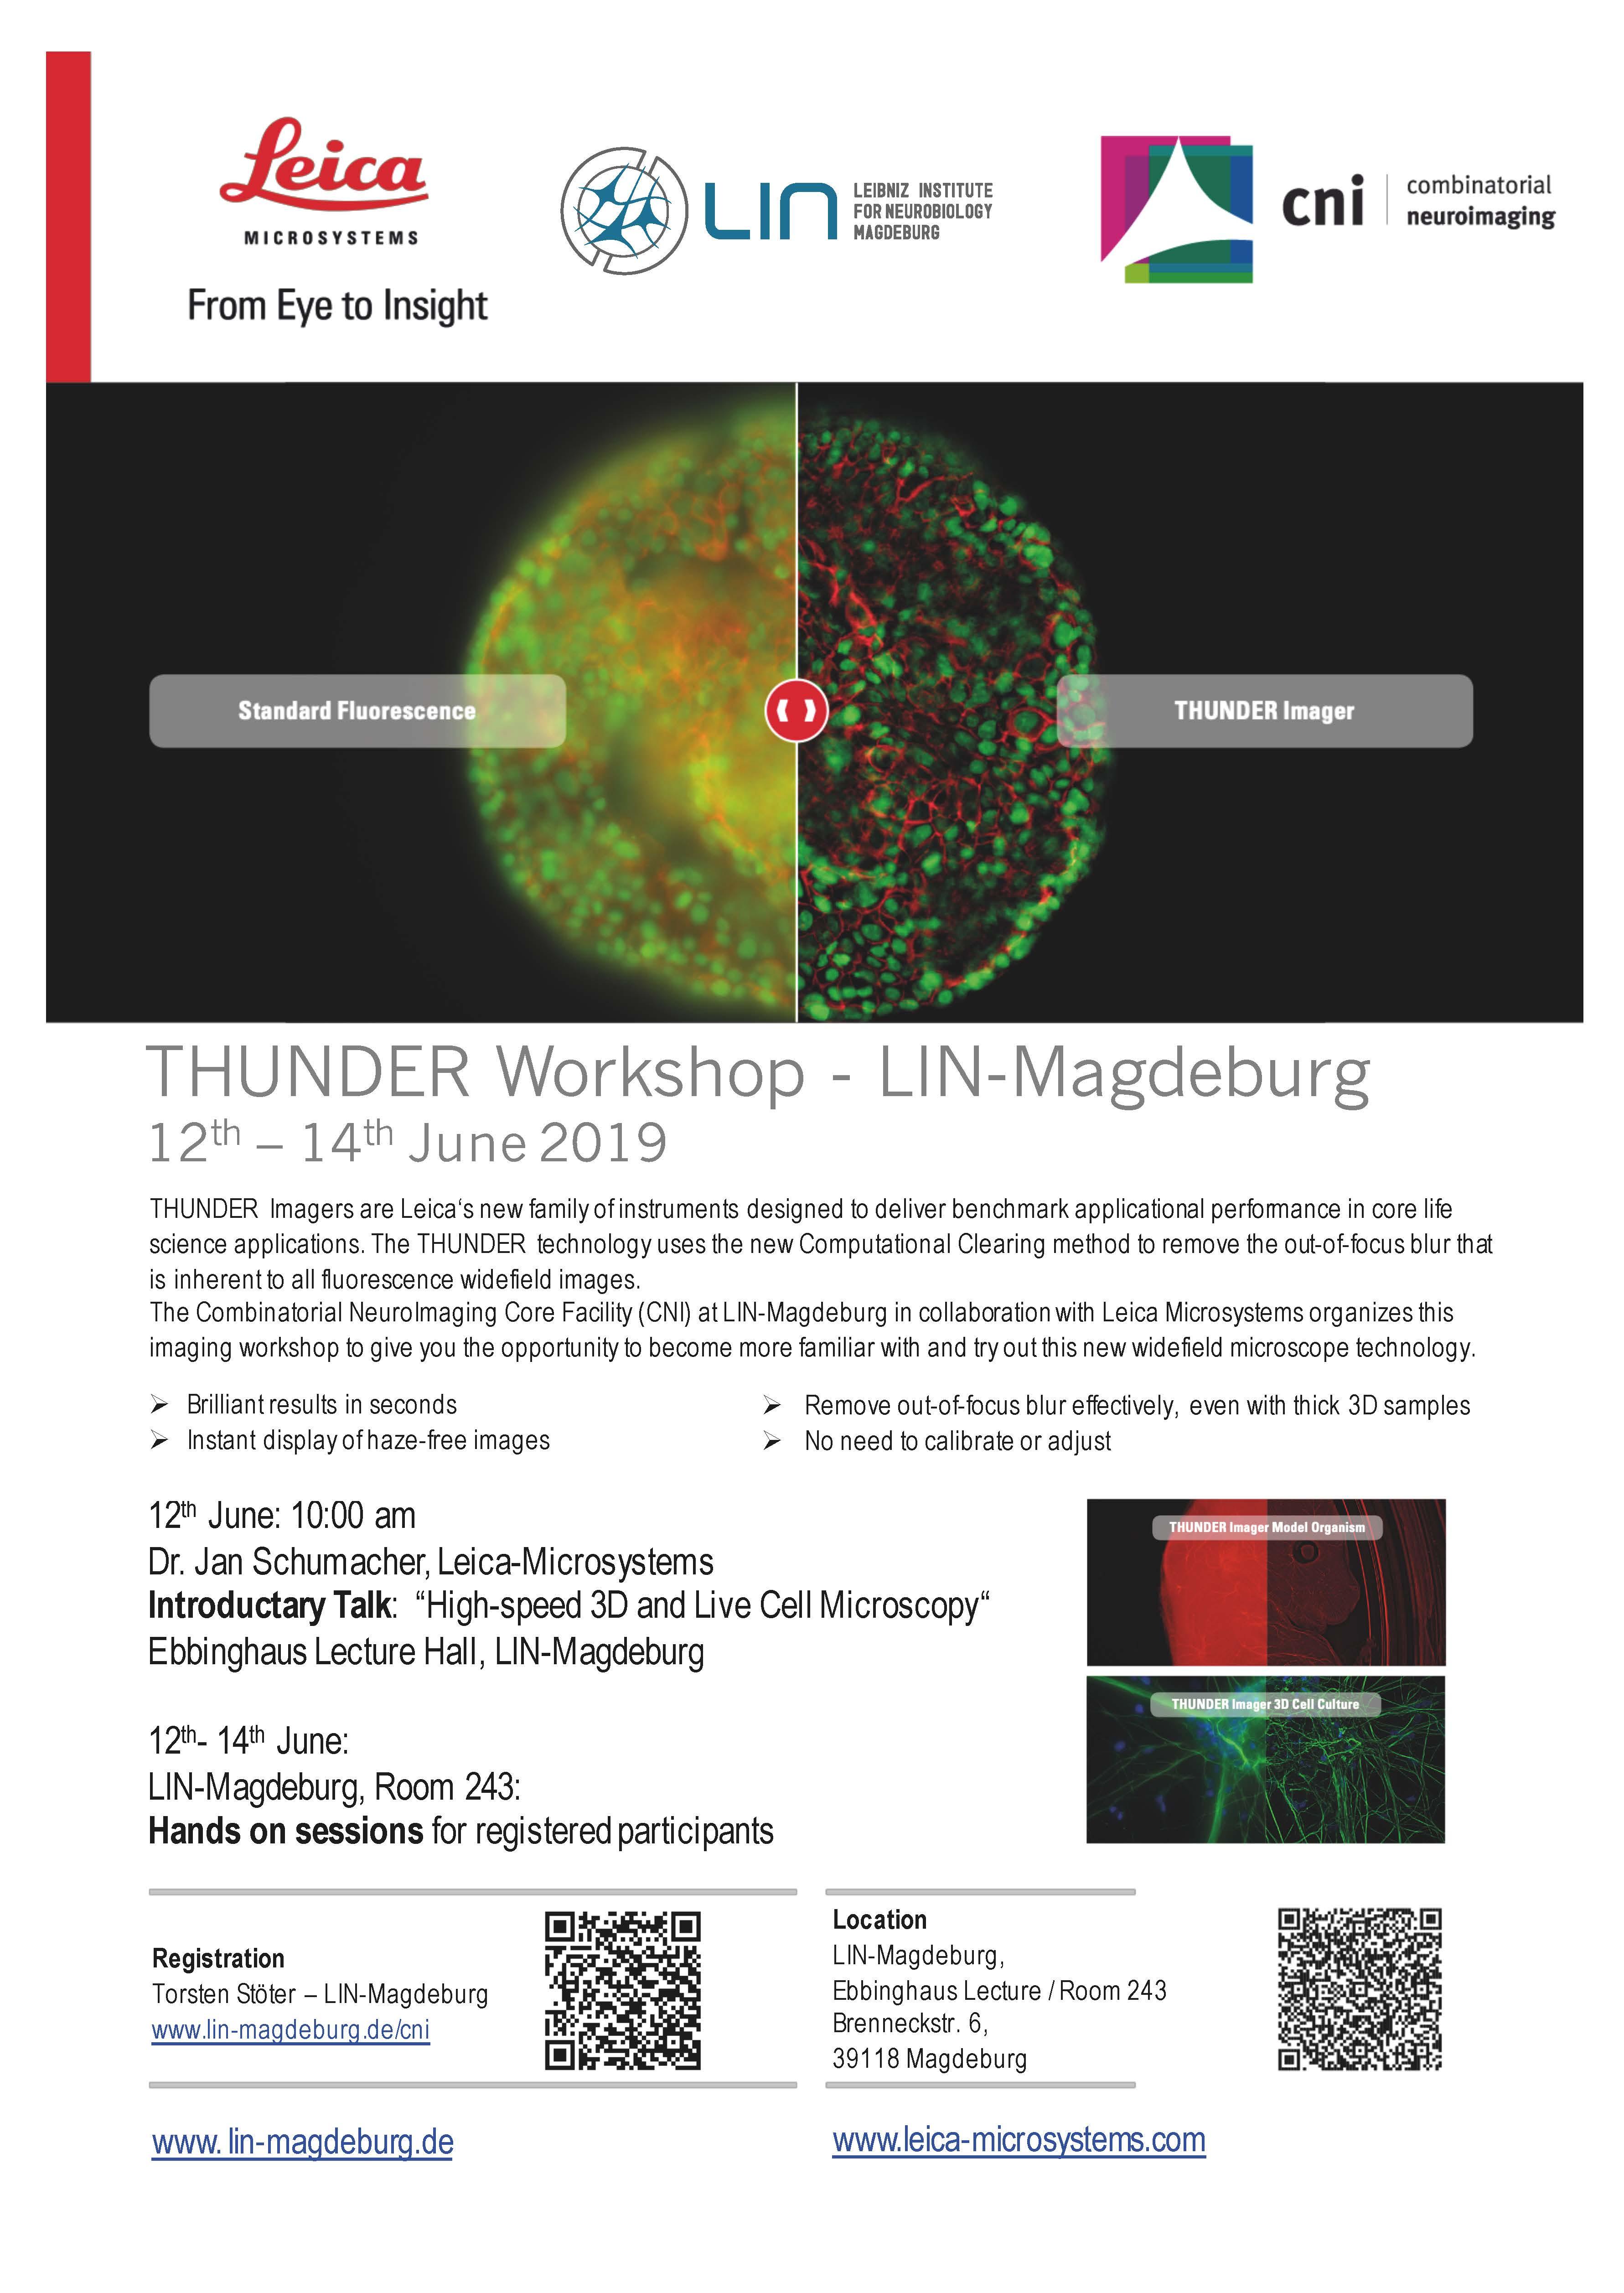 Microscopy workshop on fast 3D-live cell imaging @ Leibniz Institute for Neurobiology Magdeburg, Room 243